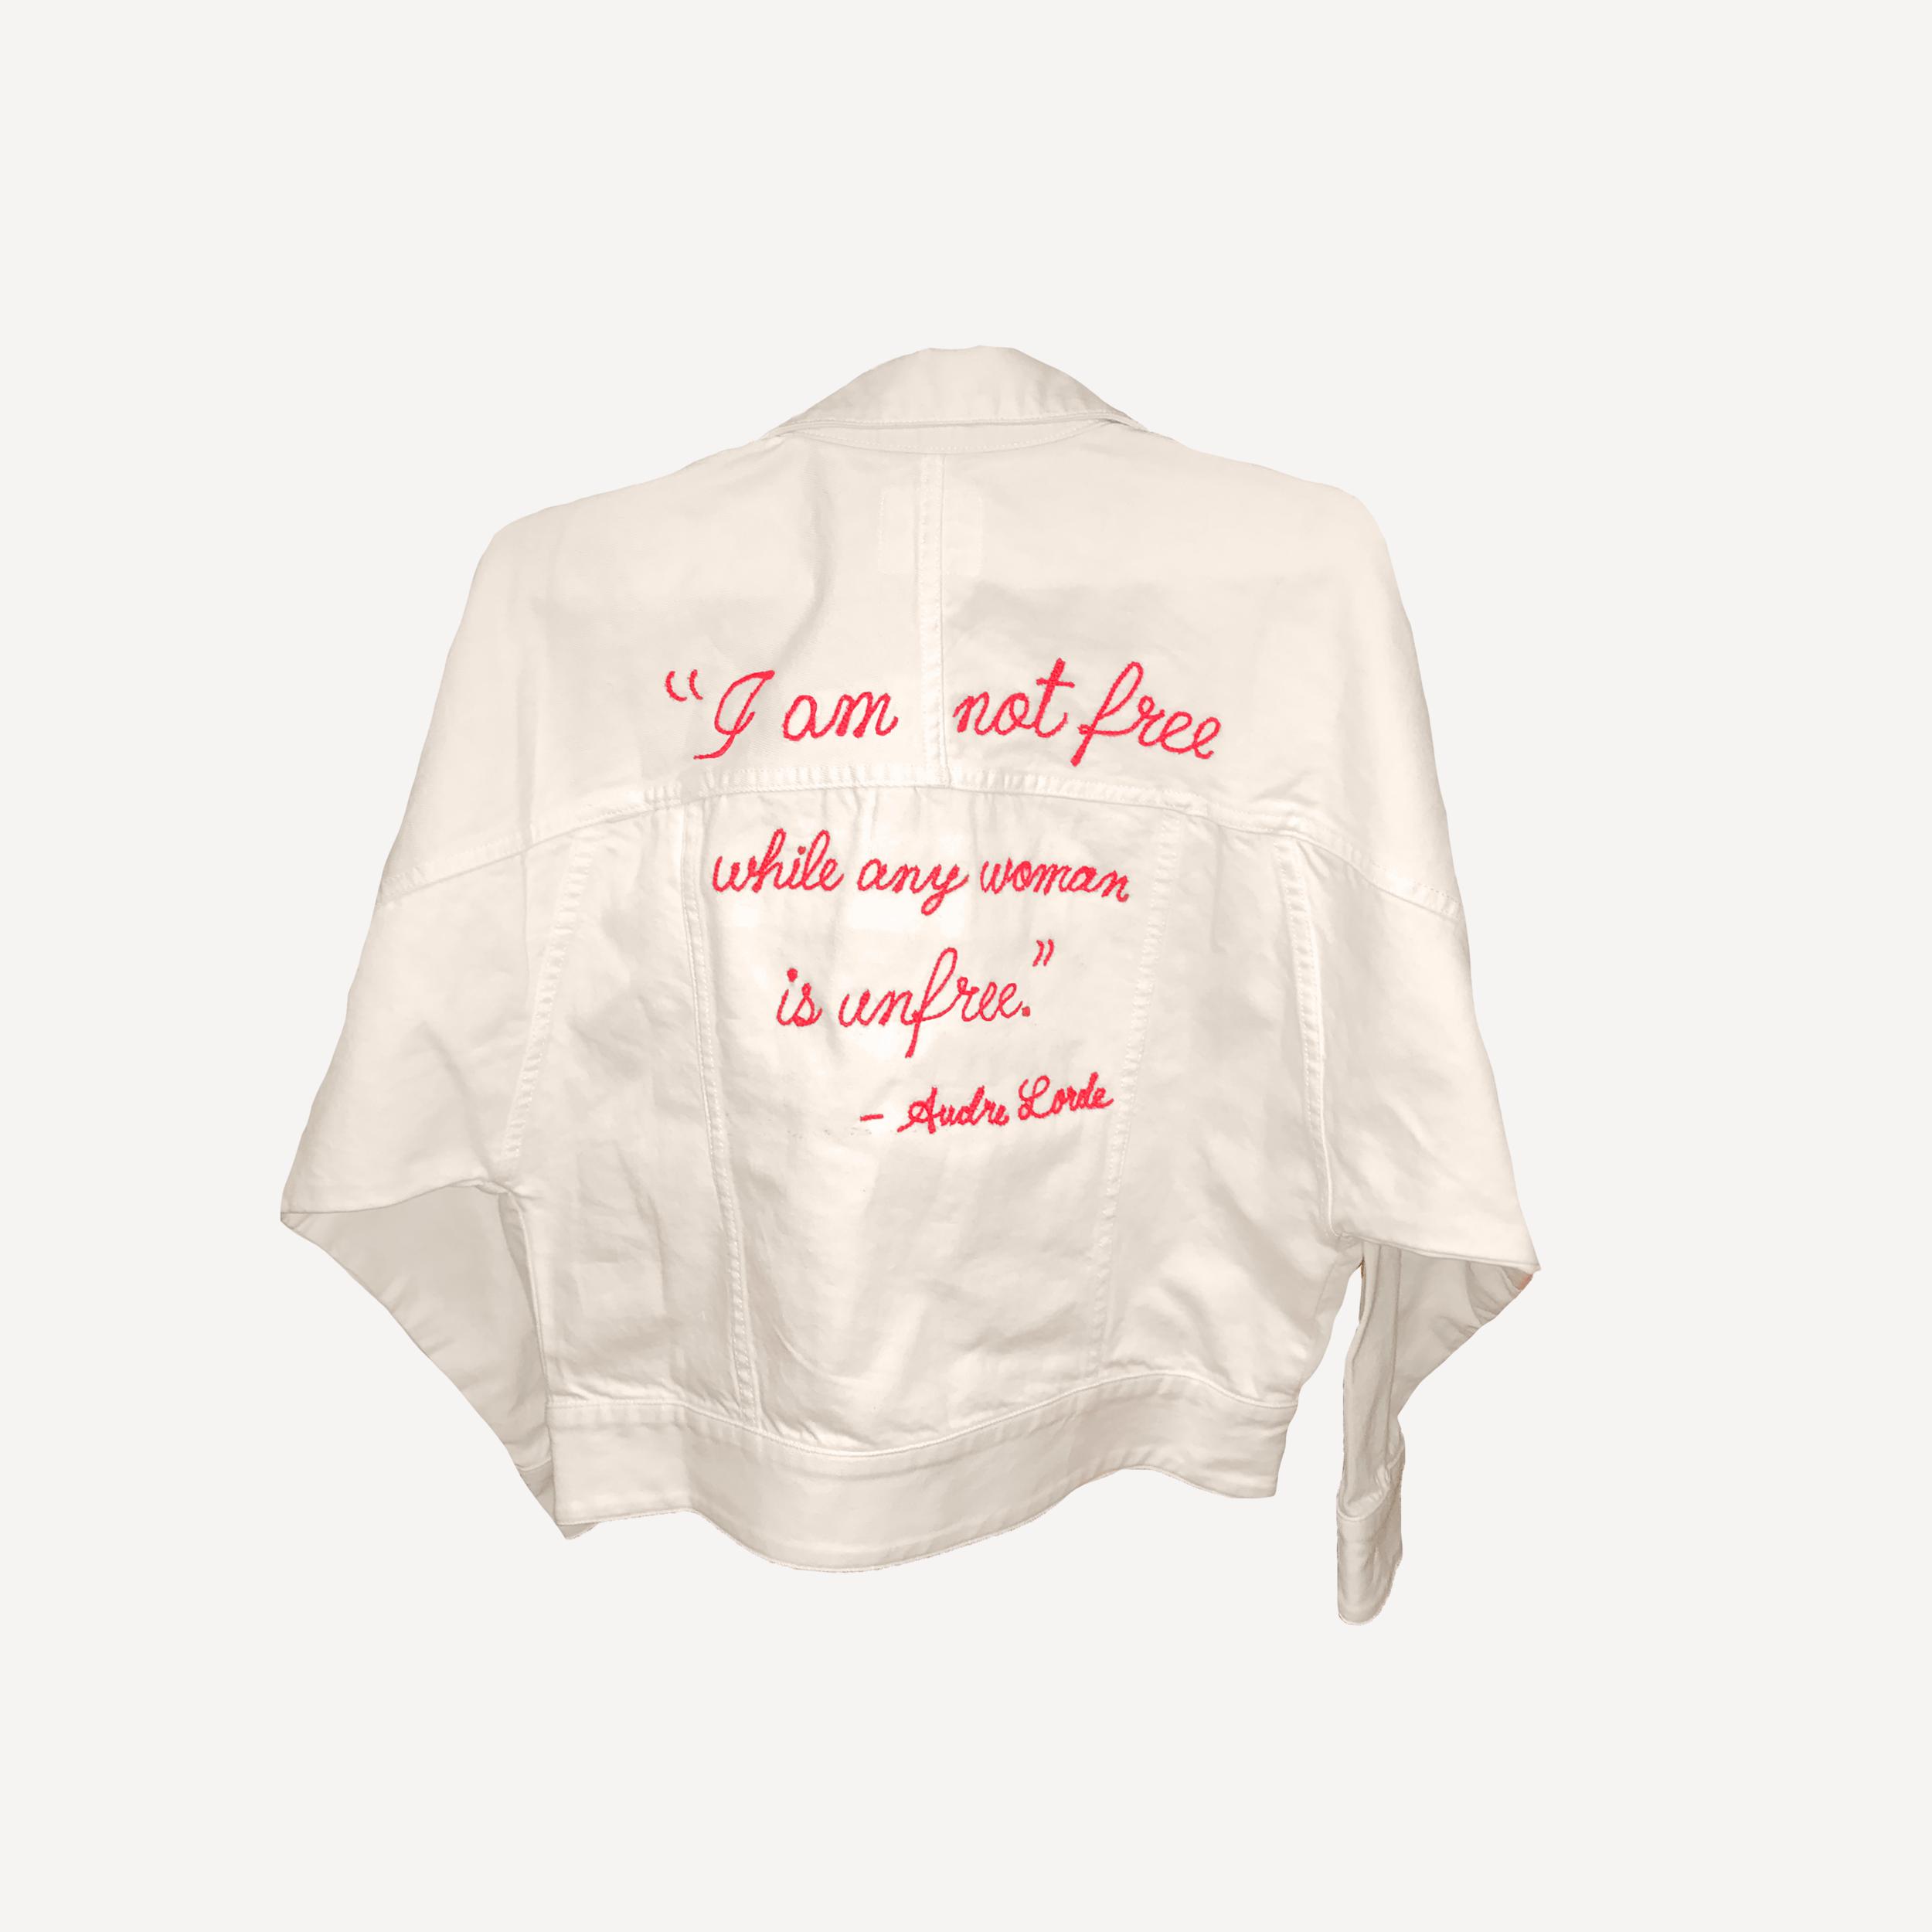 Emma Watson White Jacket Back Flat 1 copy.png